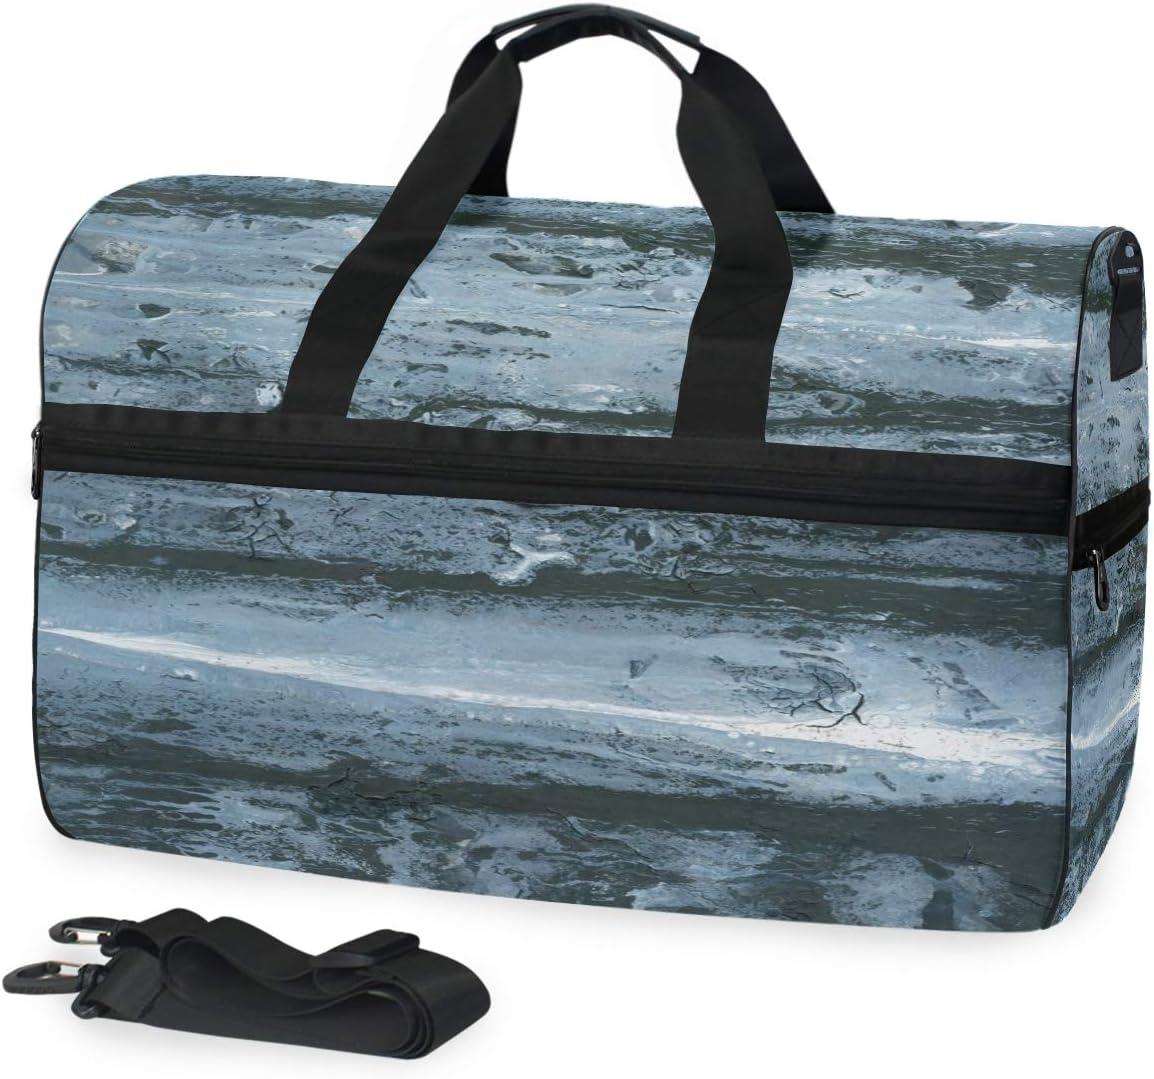 Mesa Mall supreme Sports Swim Gym Bag with Shoes Abstract Grey Painting Art Black